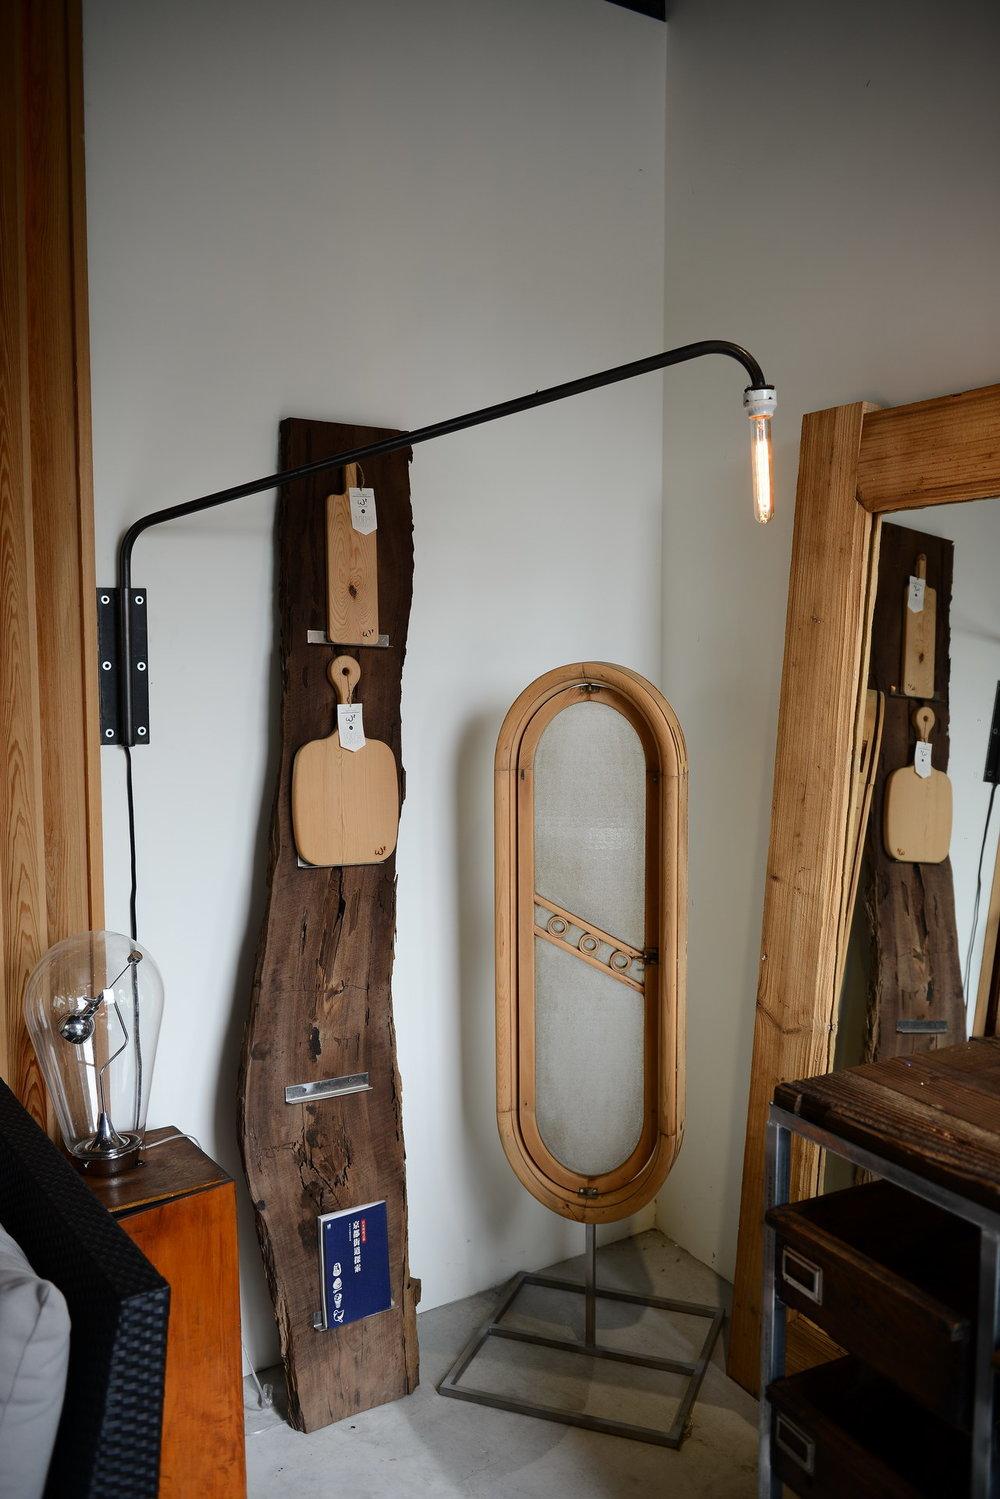 LA08 wall lamp - 長度 123 CMNT 5500 已售出/已停售